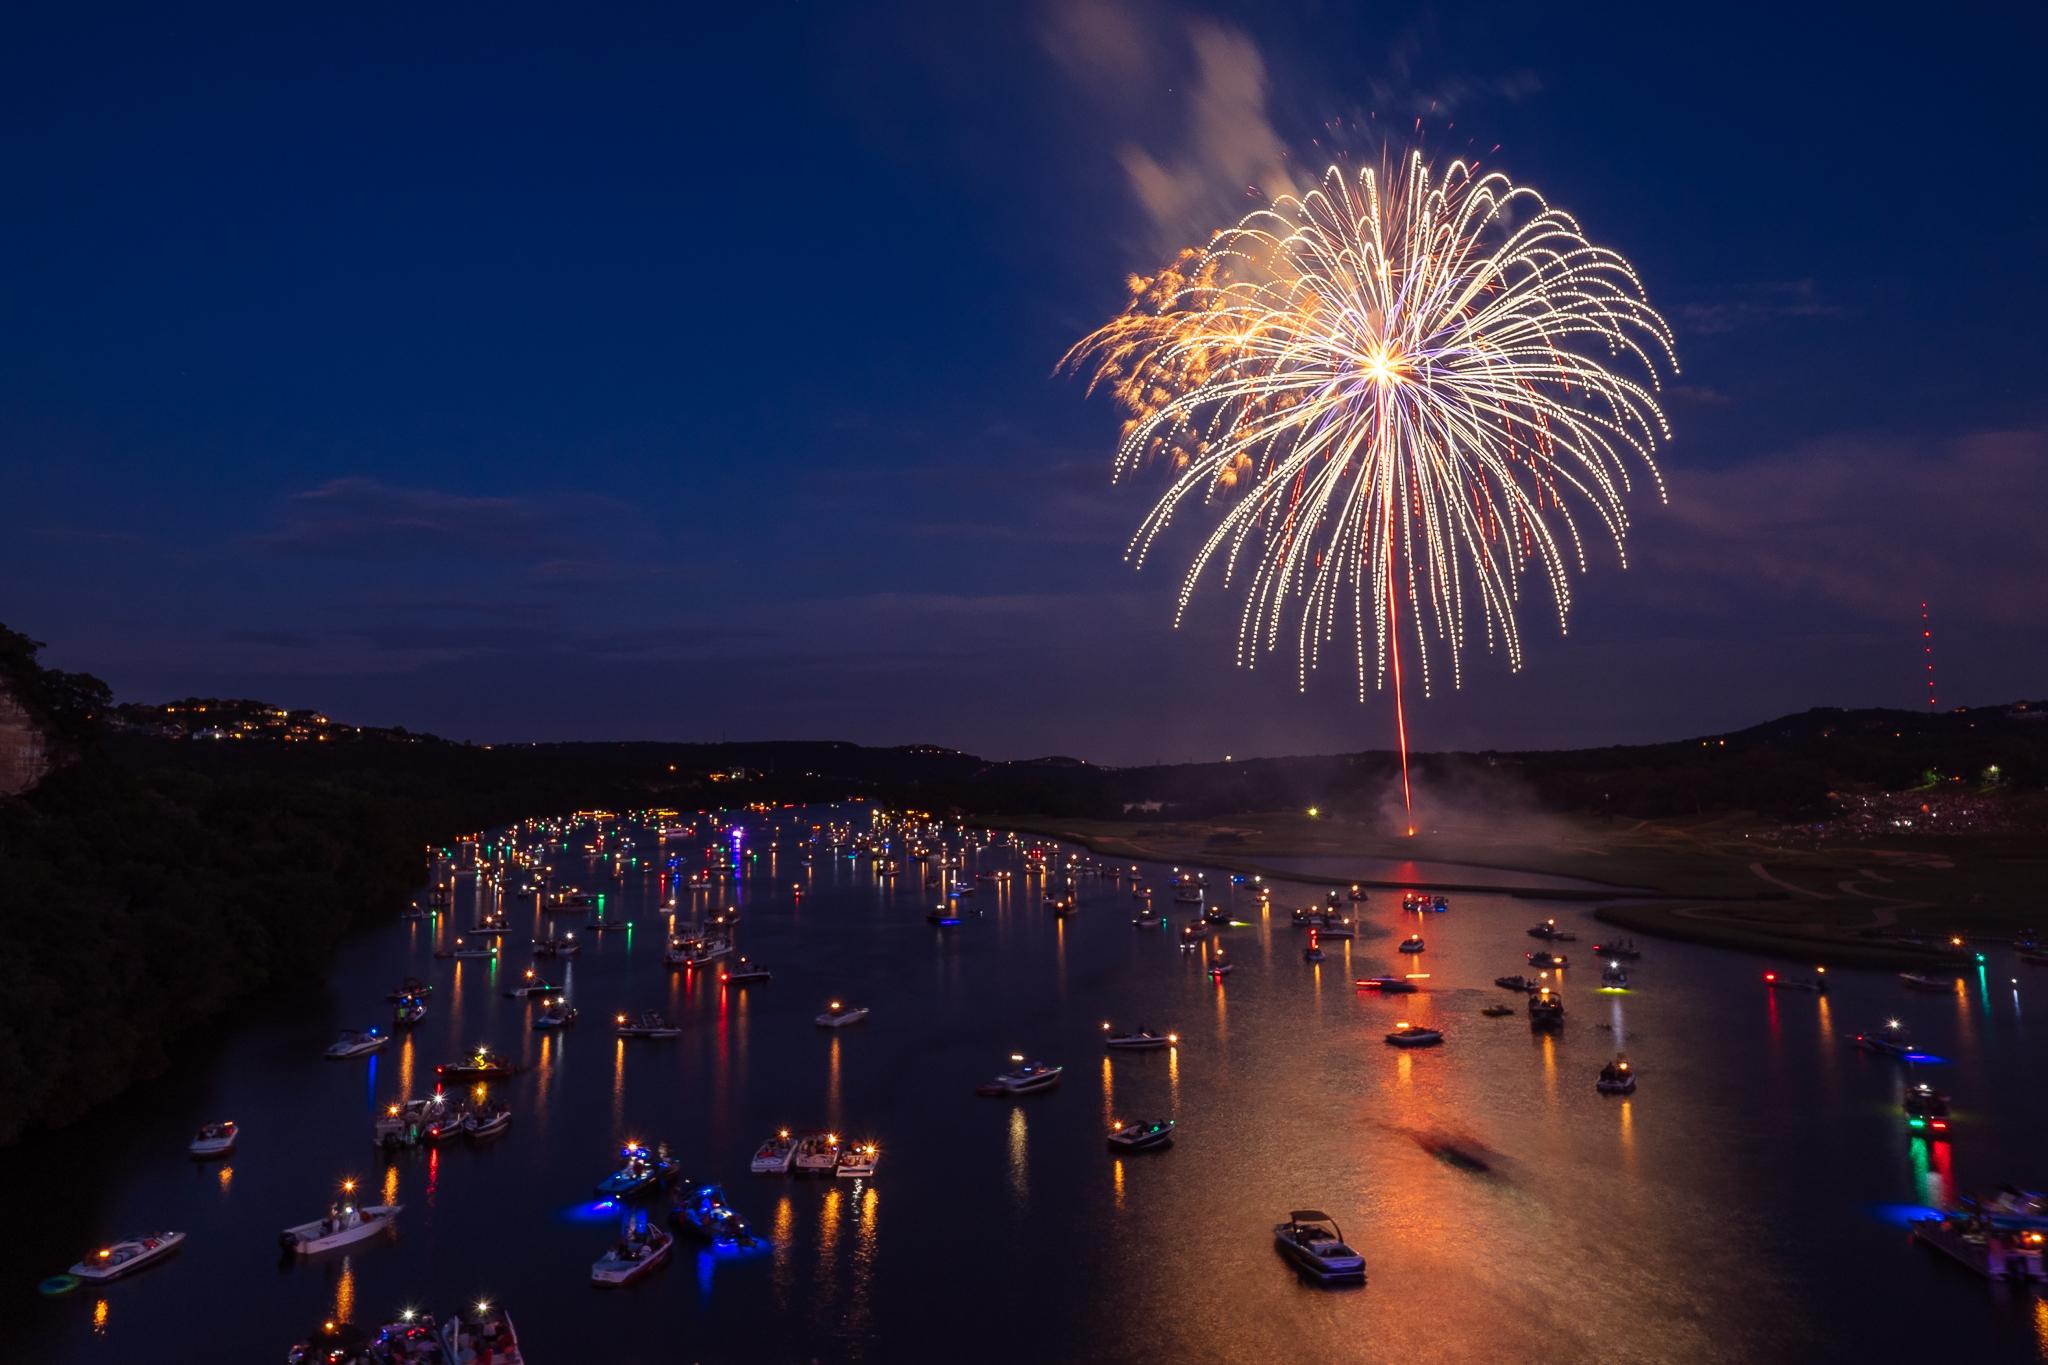 austin_fireworks_2014_10.jpg